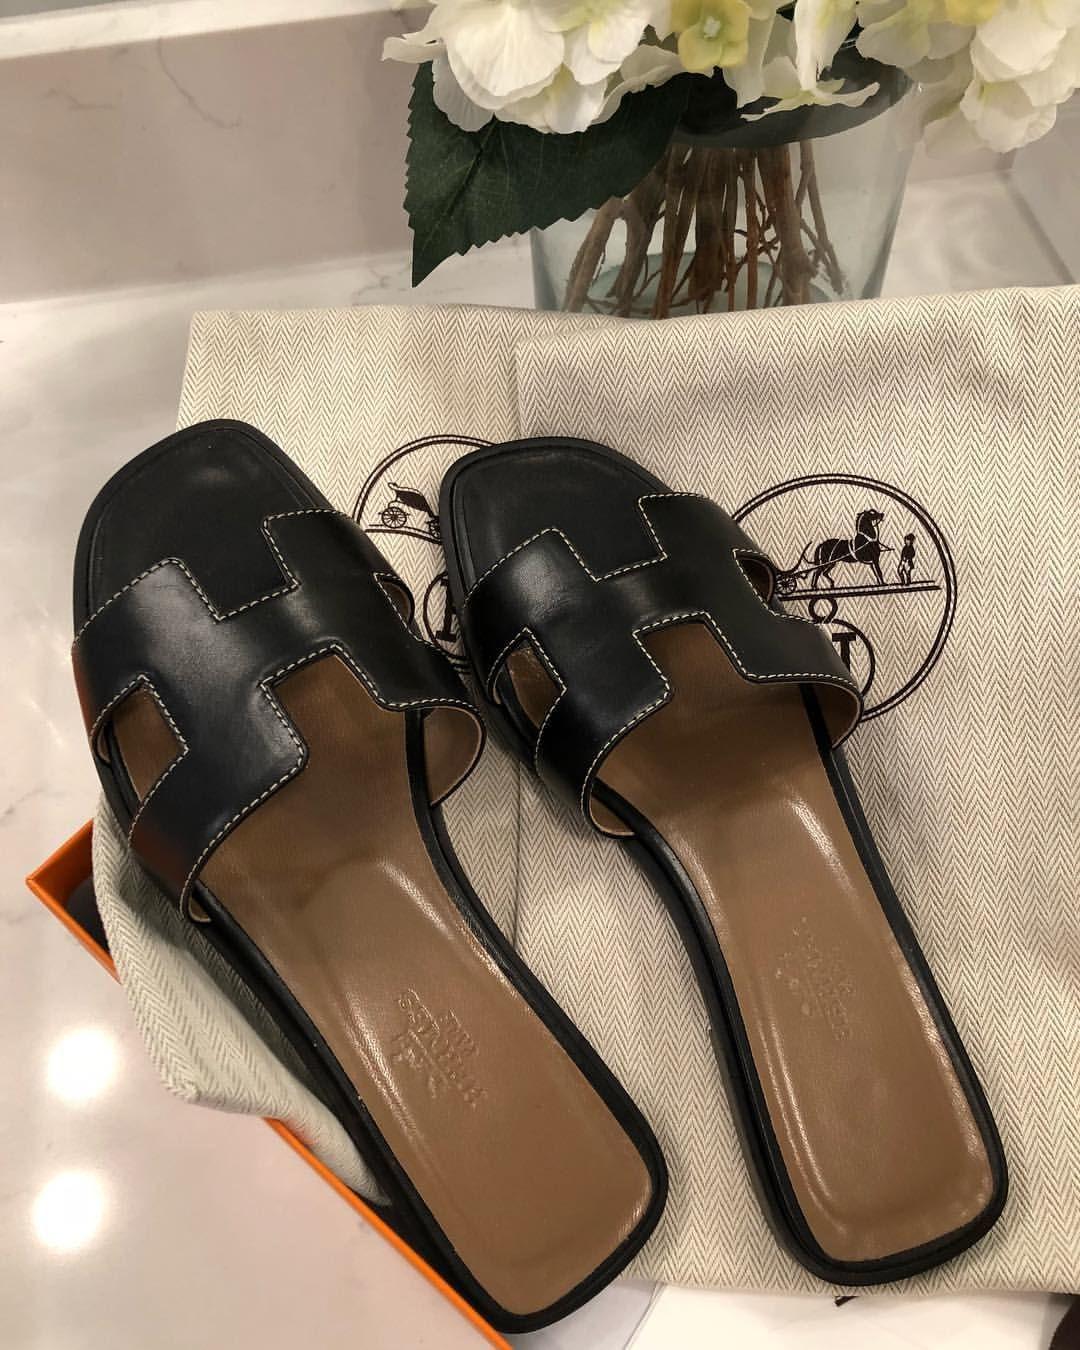 Hermes. | Shoes, Luxury shoes, Sandals